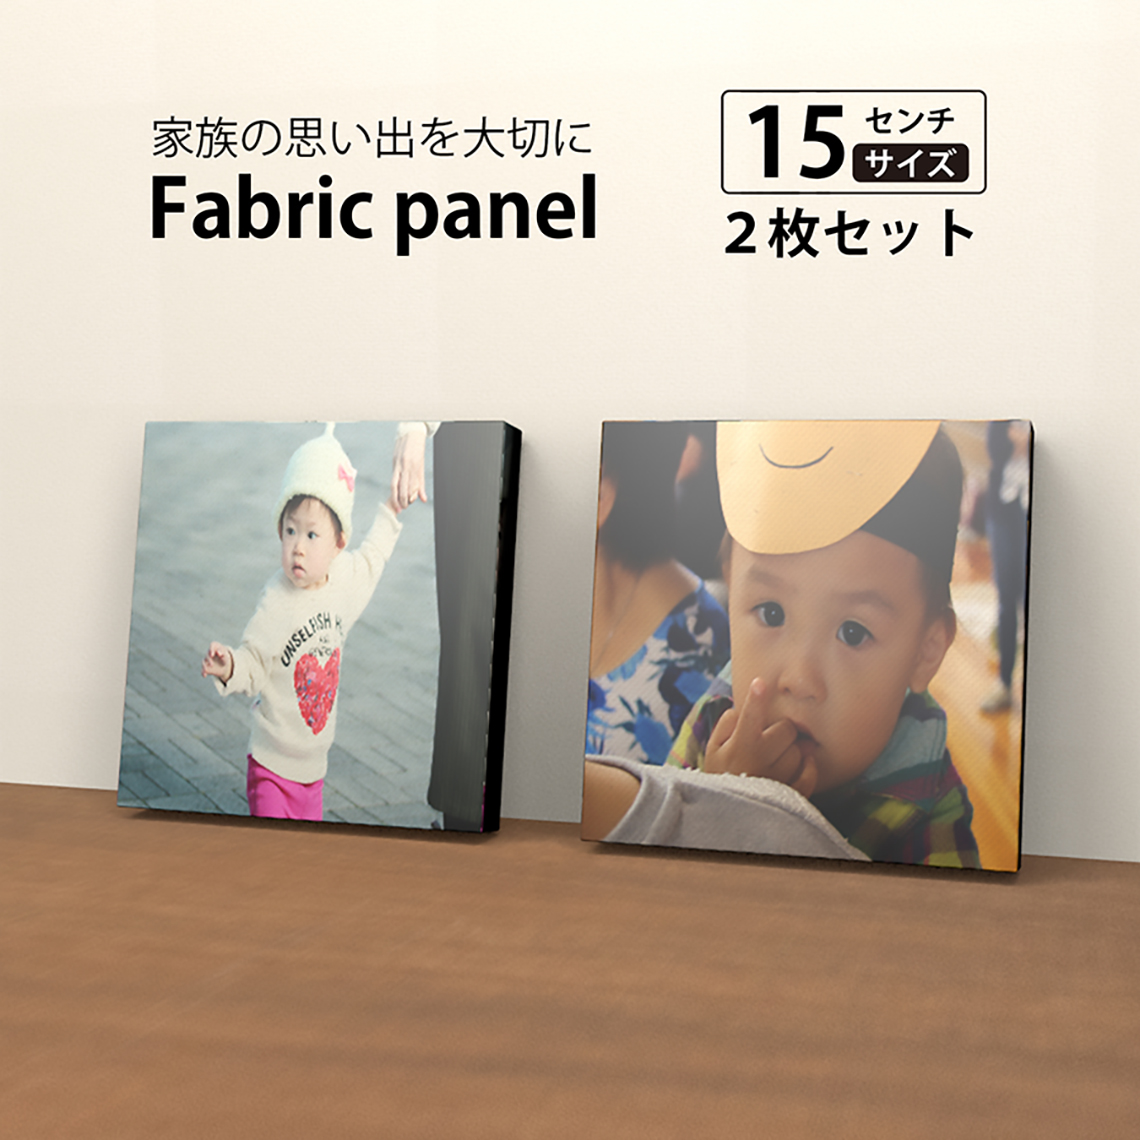 15cmサイズのファブリックパネル2セット 写真を印刷 ファブリックパネル 15cmサイズ キャンバスパネル オーダーメイド 結婚写真 子供絵 記念写真 日本 プレゼント 子供写真 ギフト 気質アップ